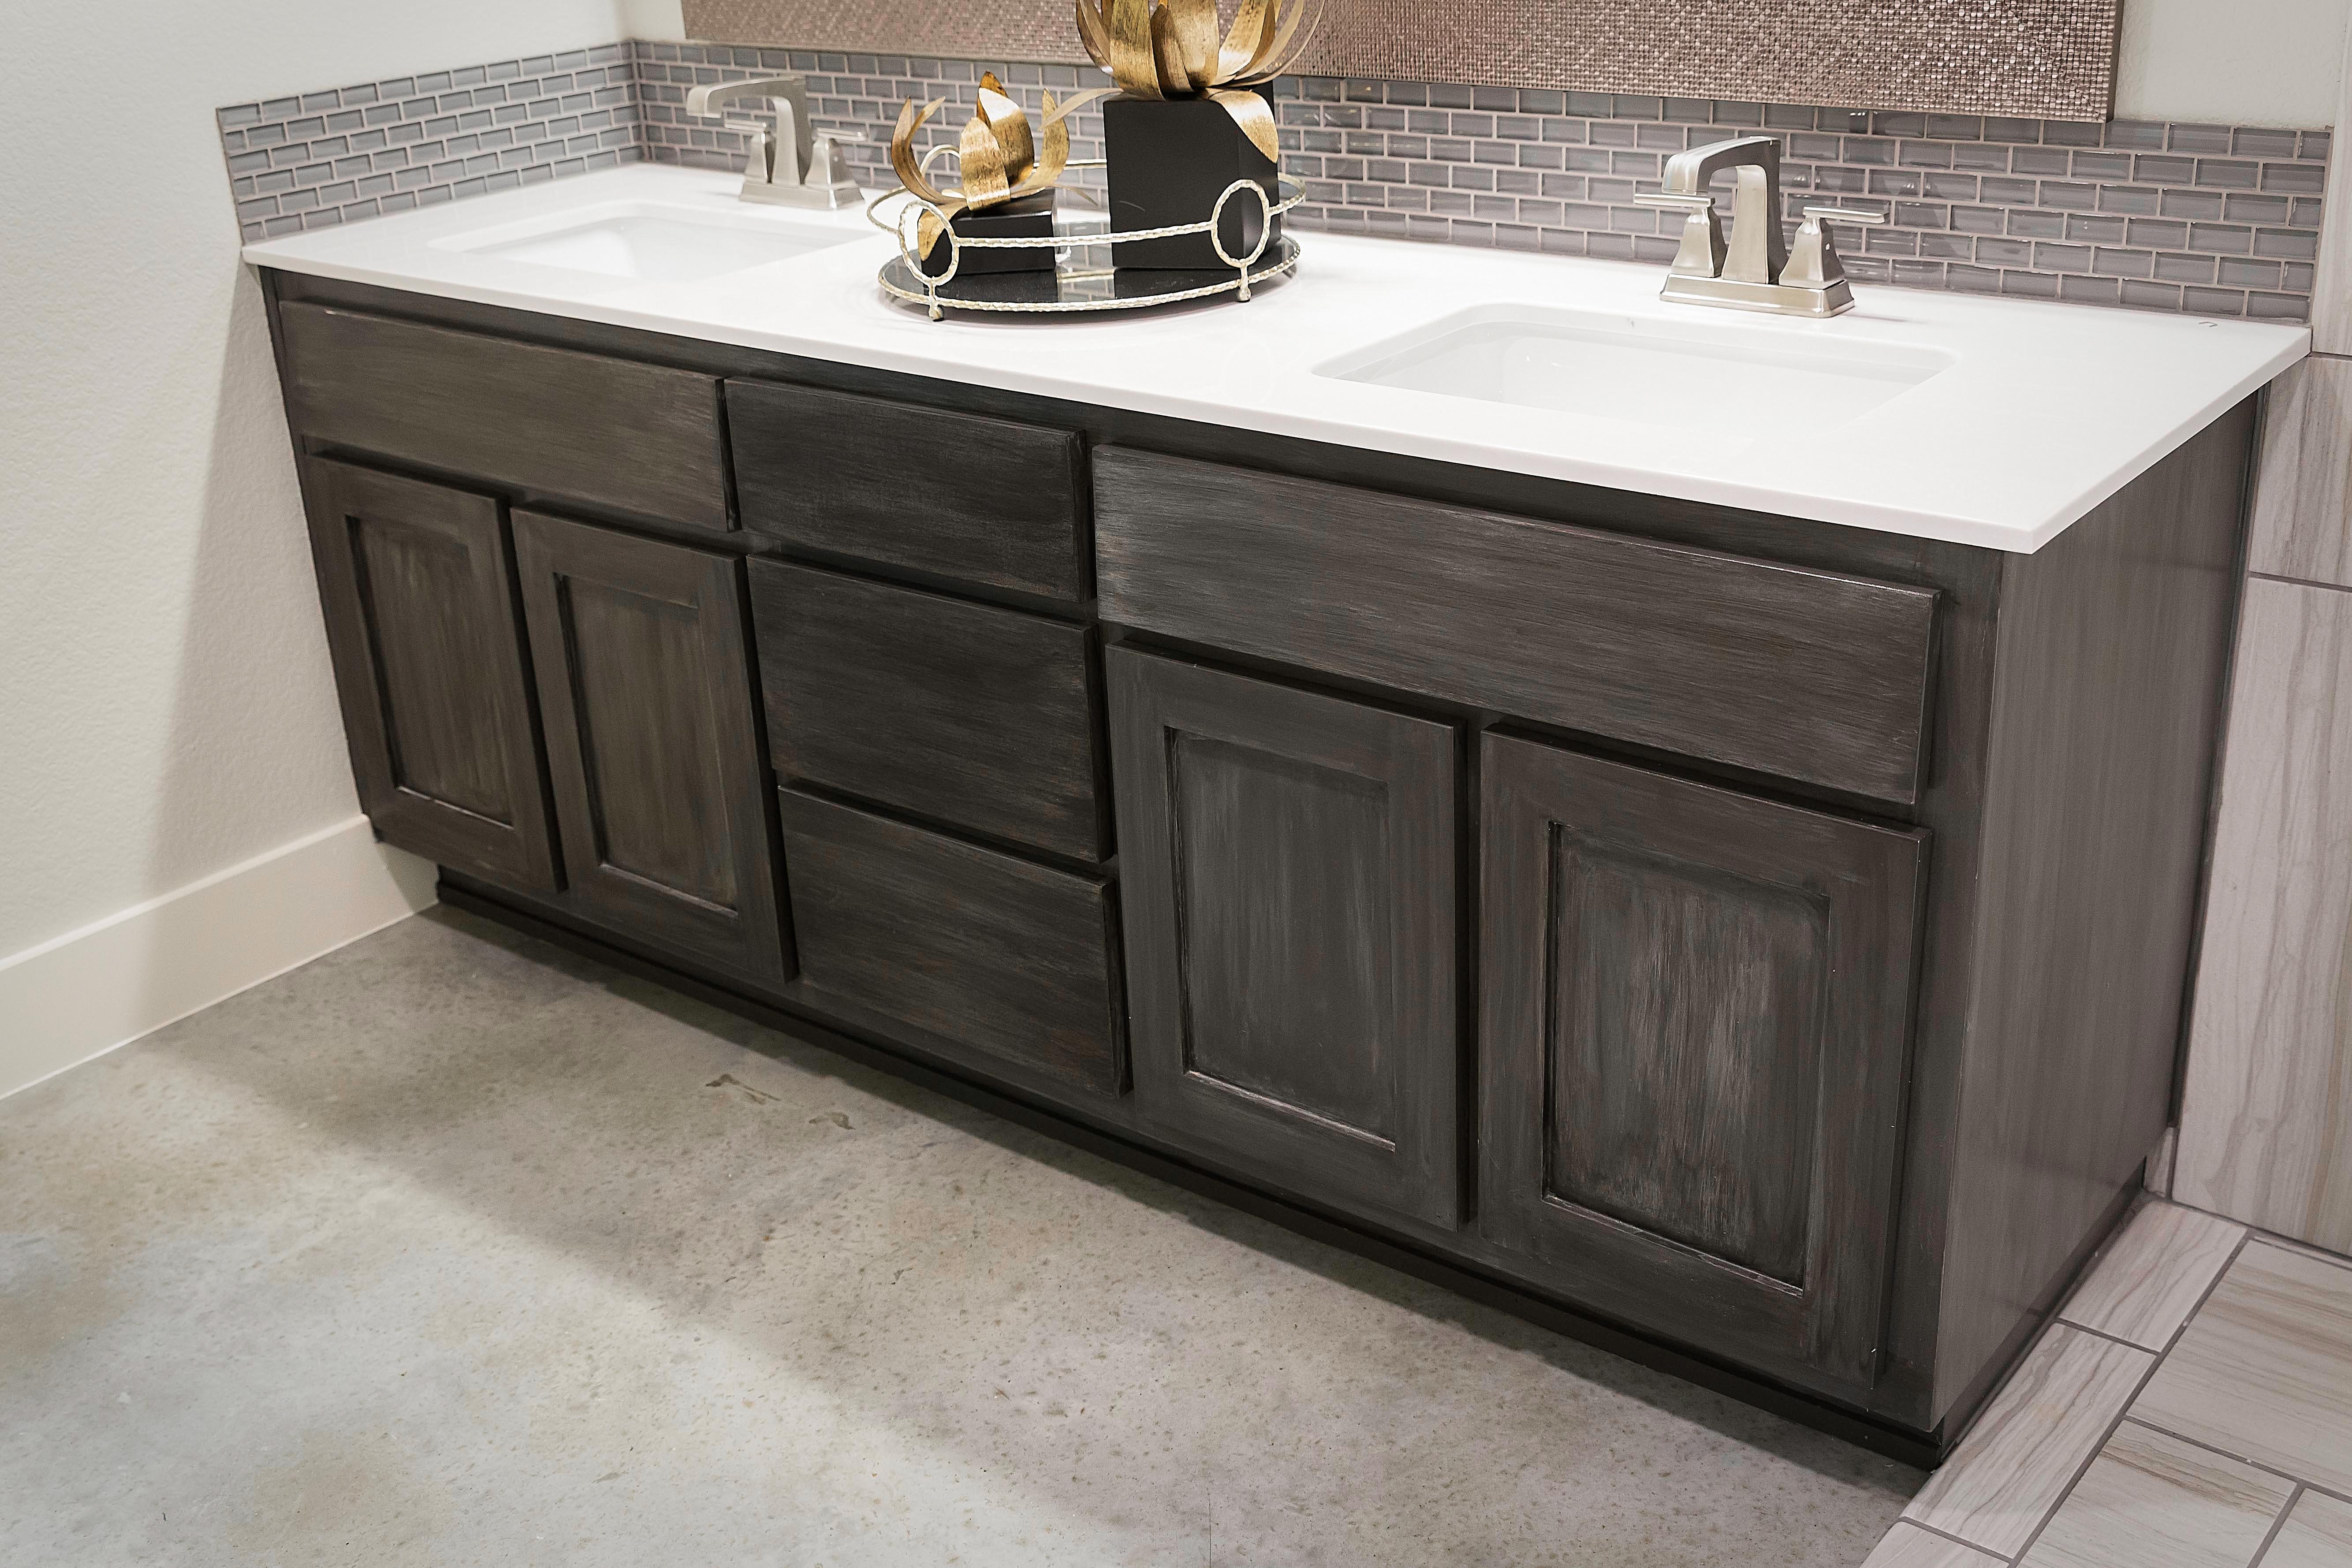 Custom Antiqued Cabinets